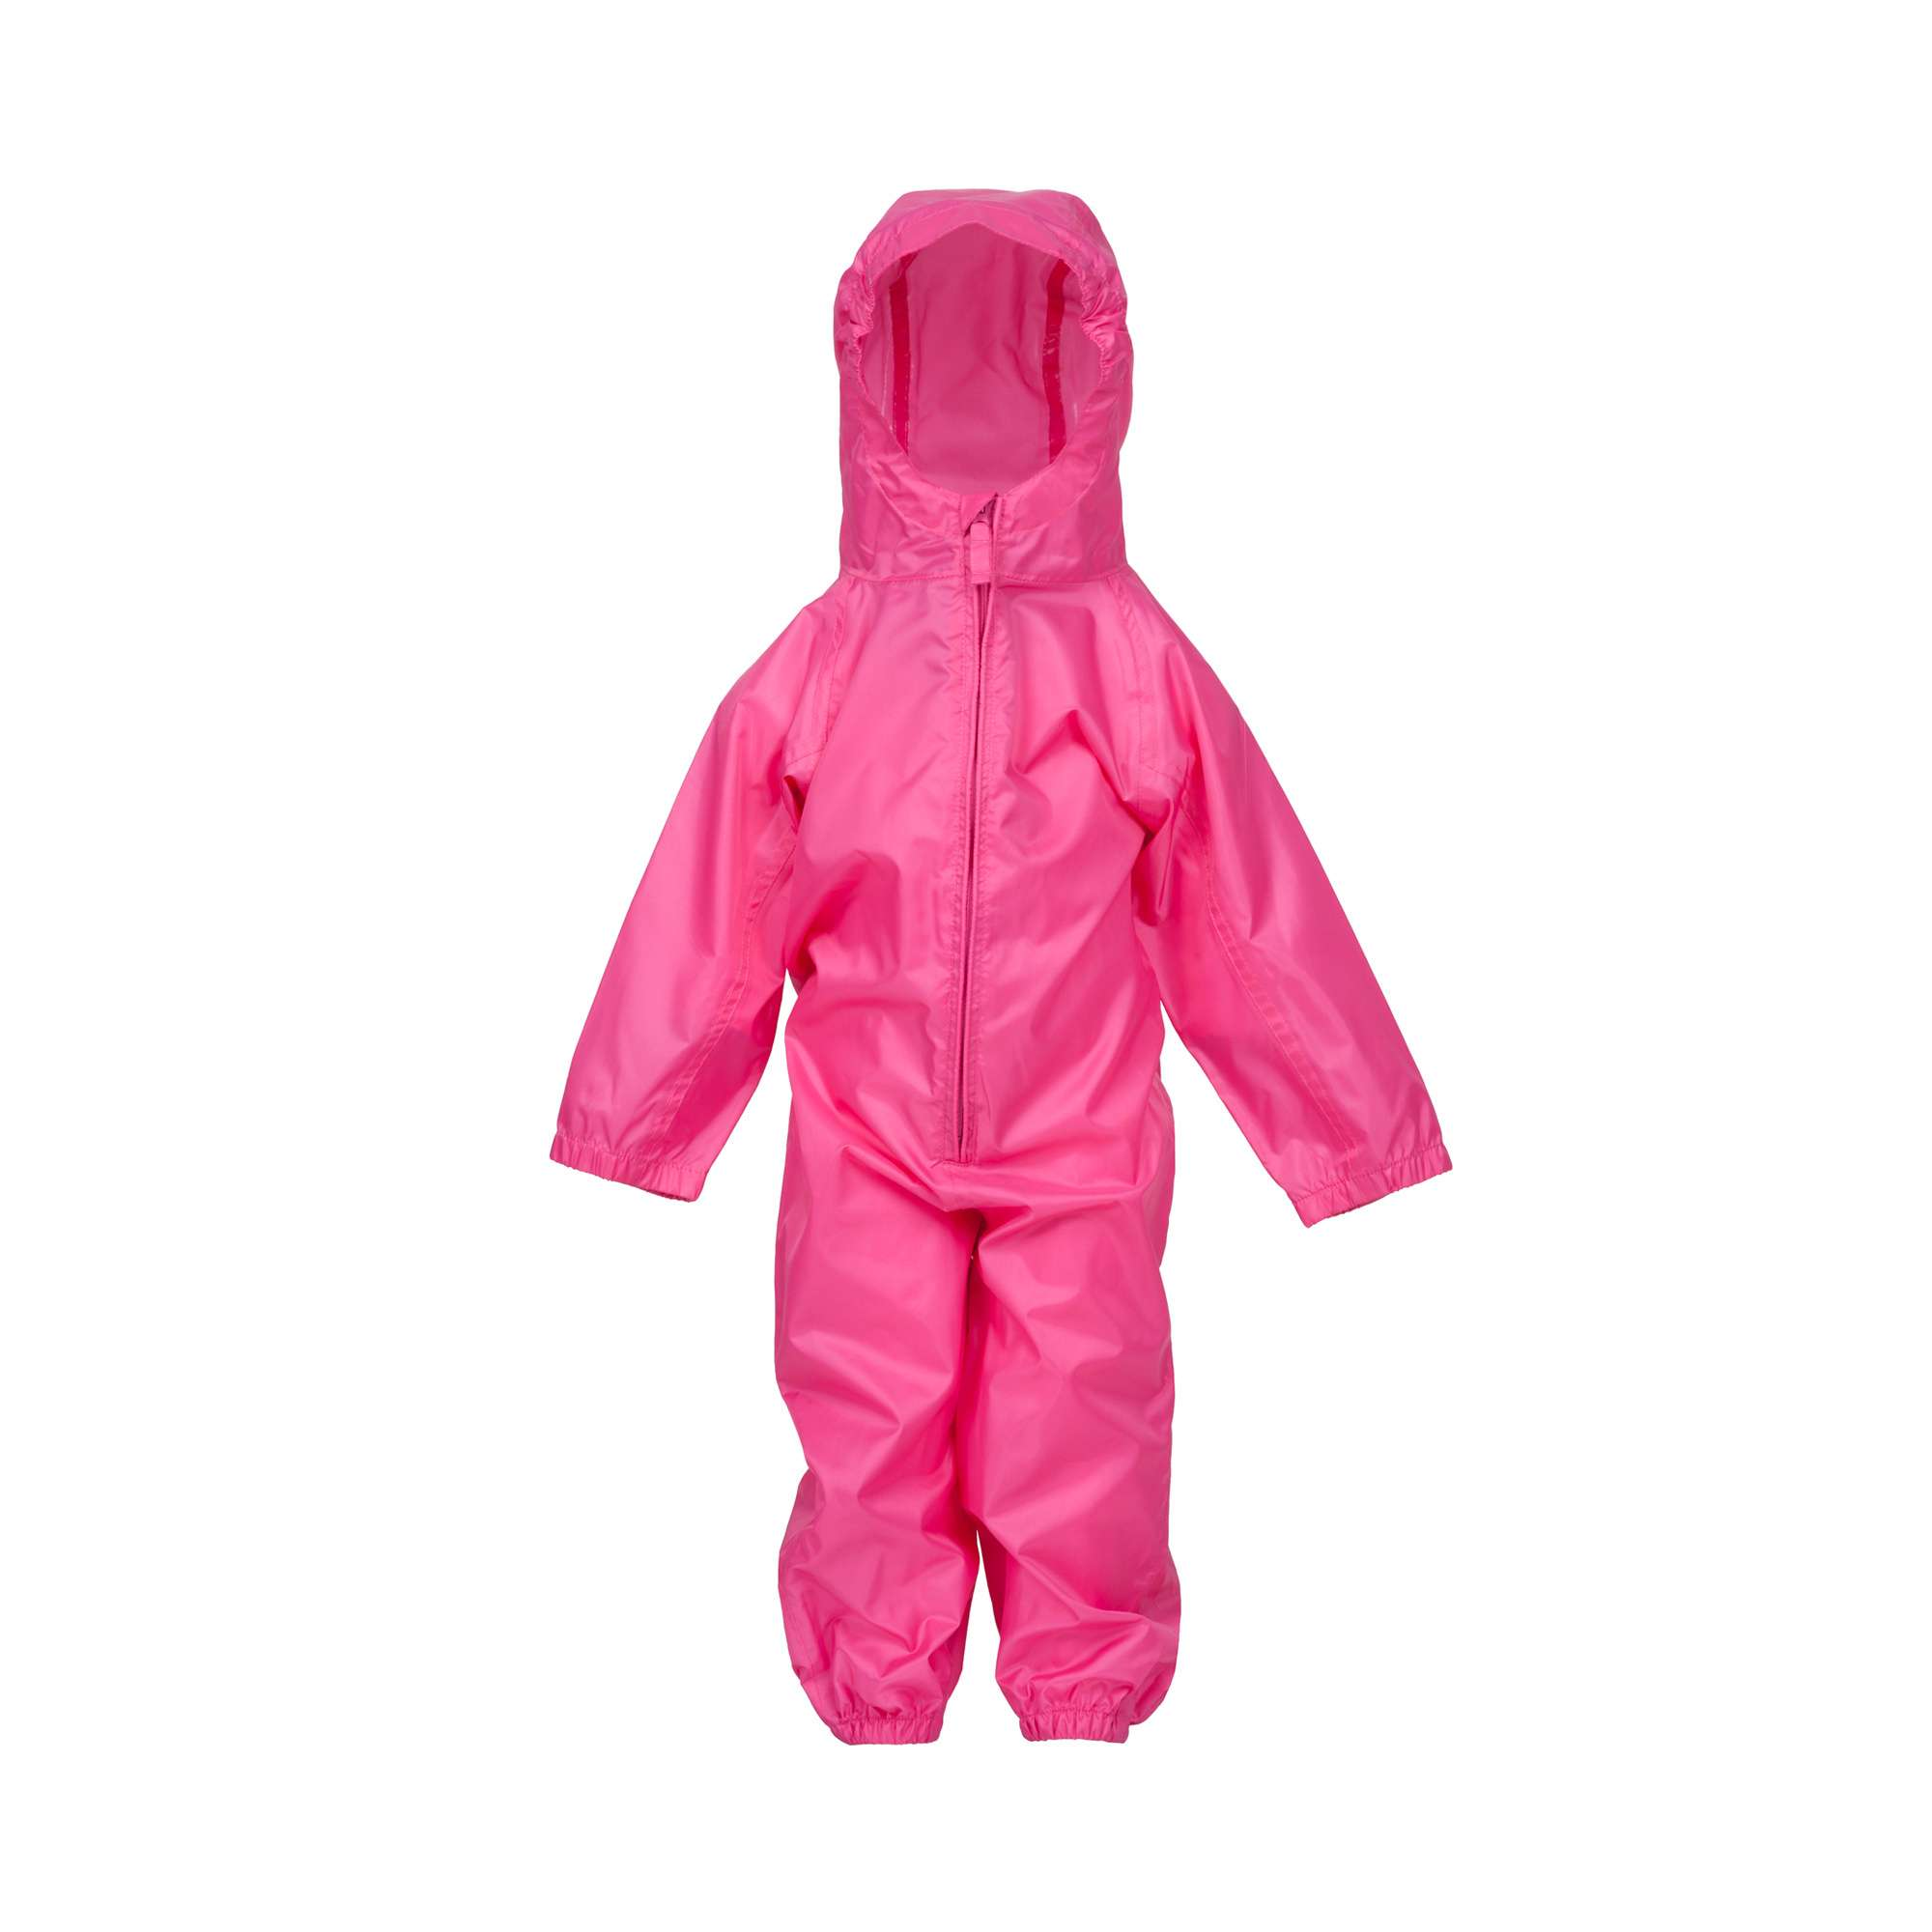 PETER STORM Kids' Waterproof All-in-One Suit